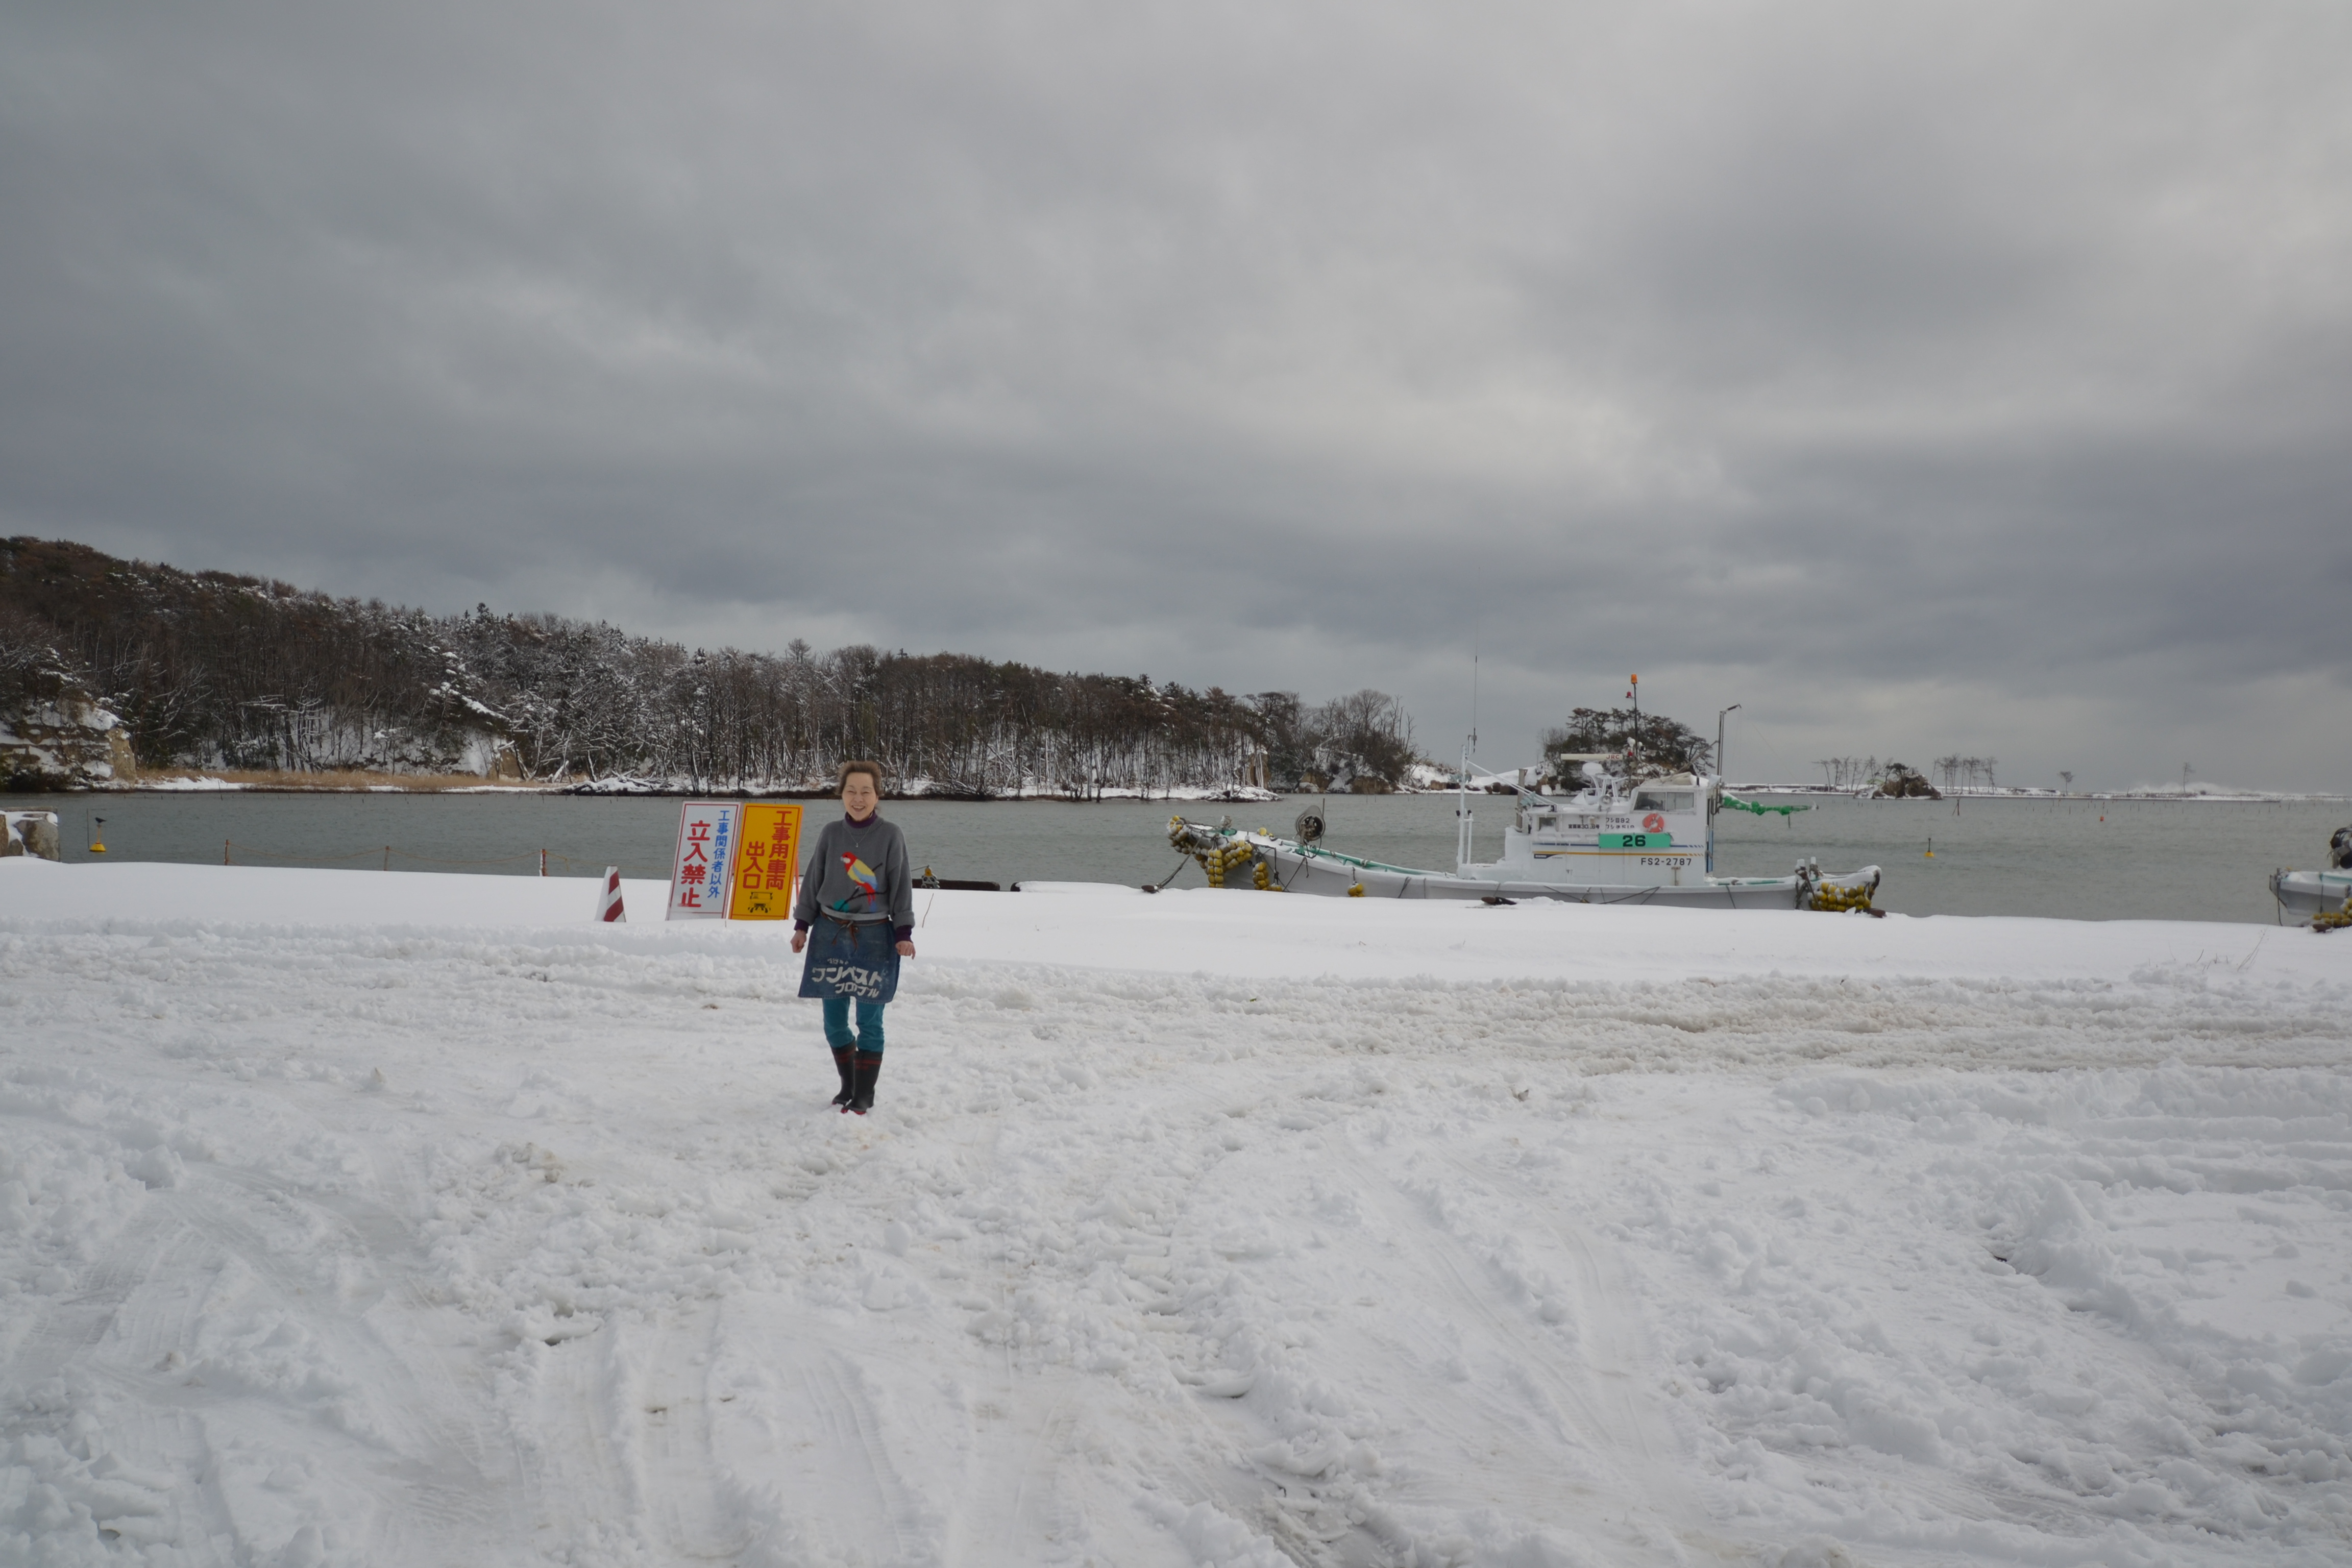 soma fishing port after snowstorm.JPG